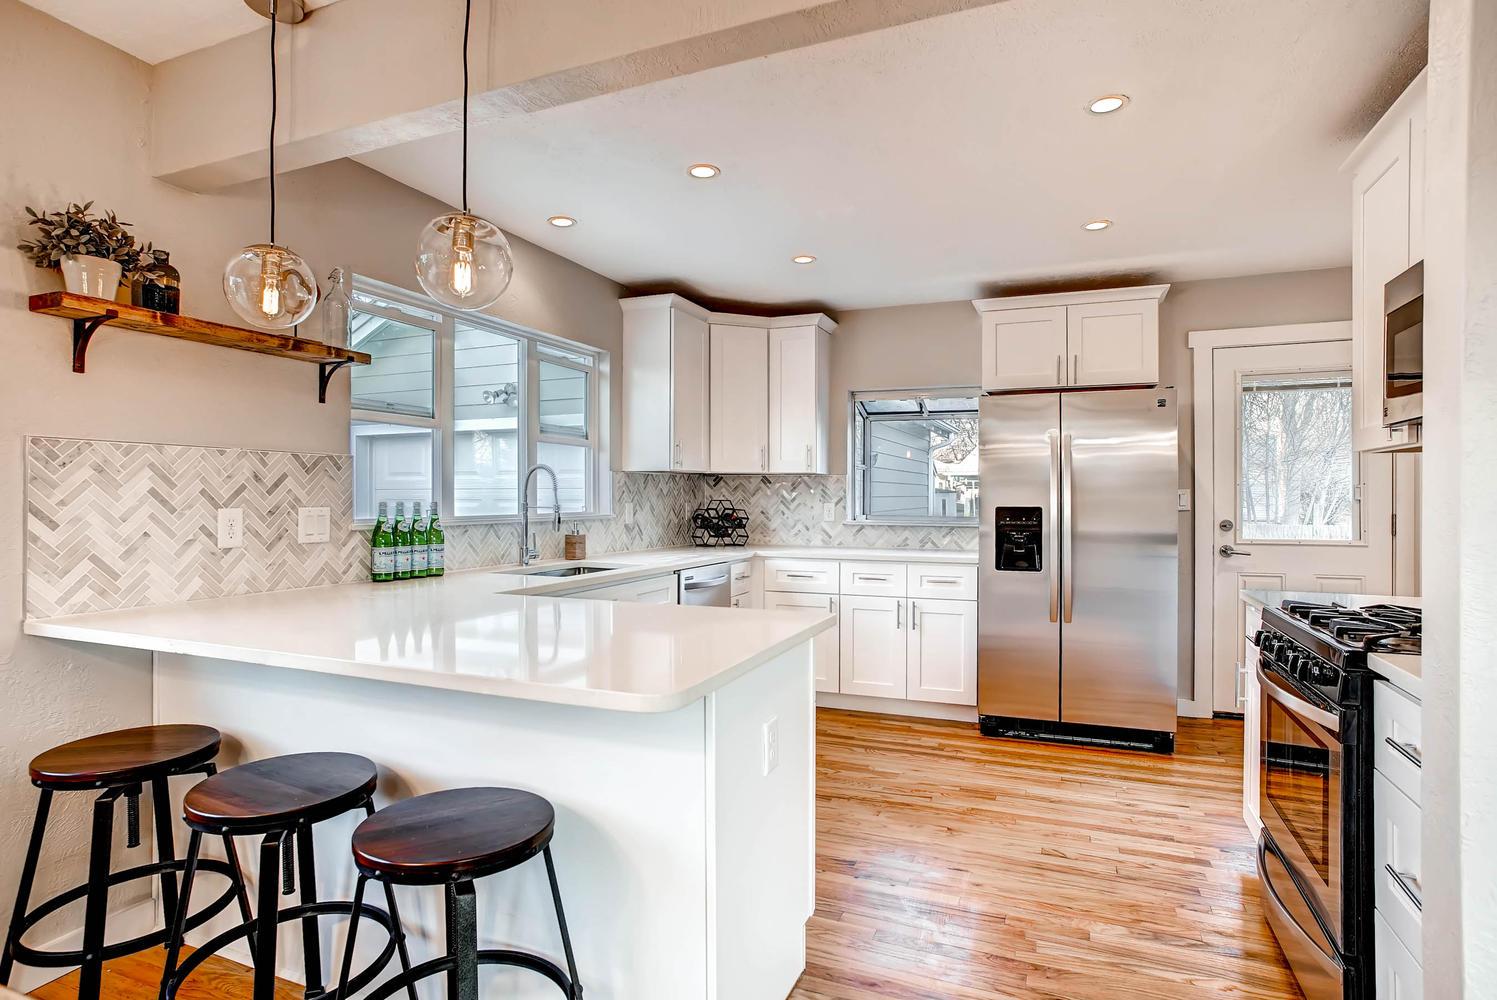 2550 S Bellaire St Denver CO-large-004-4-Kitchen-1497x1000-72dpi.jpg